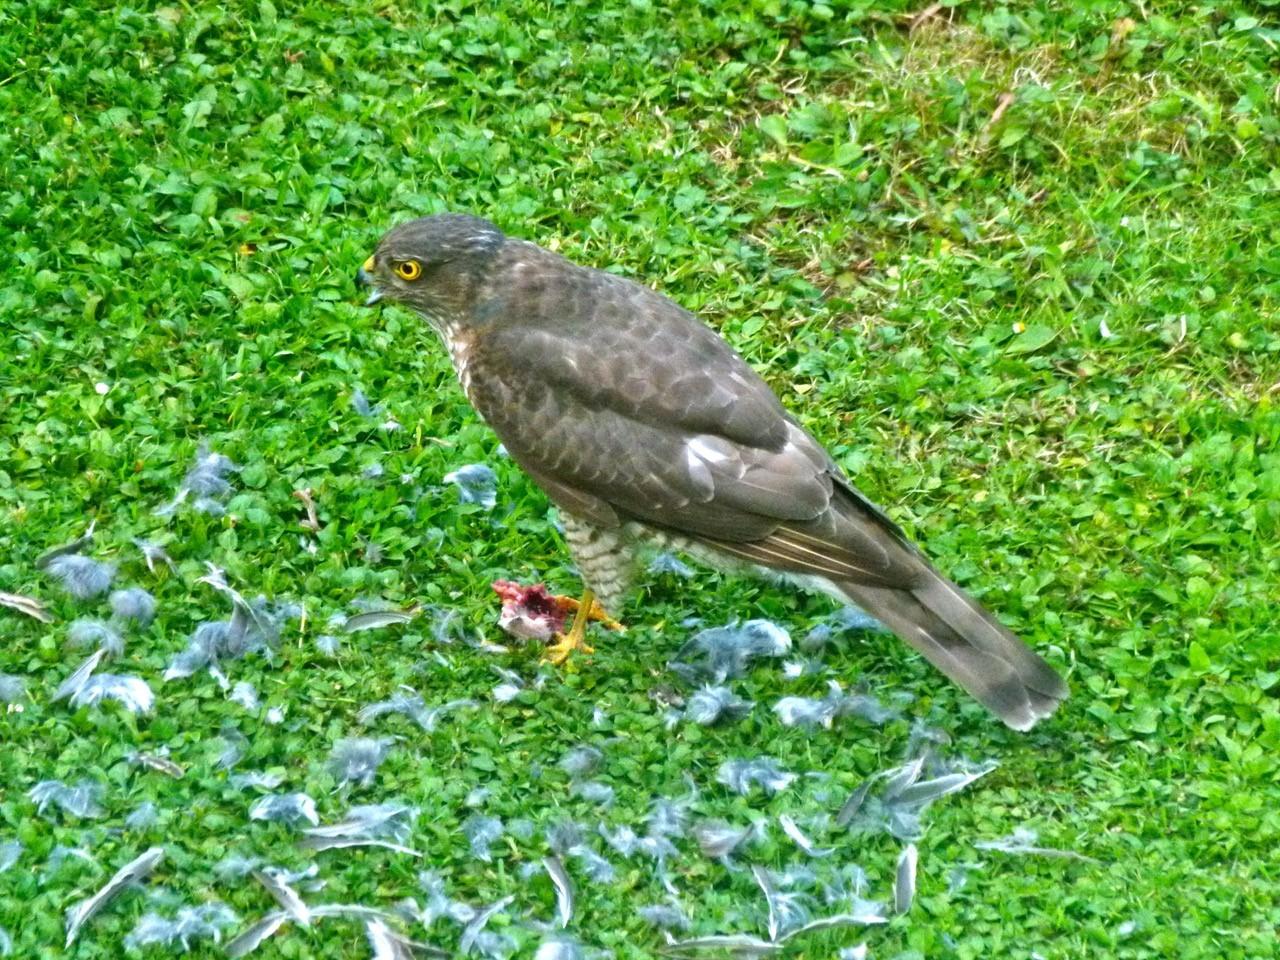 Sparrowhawk (Accipiter nisus), Intake, Doncaster.